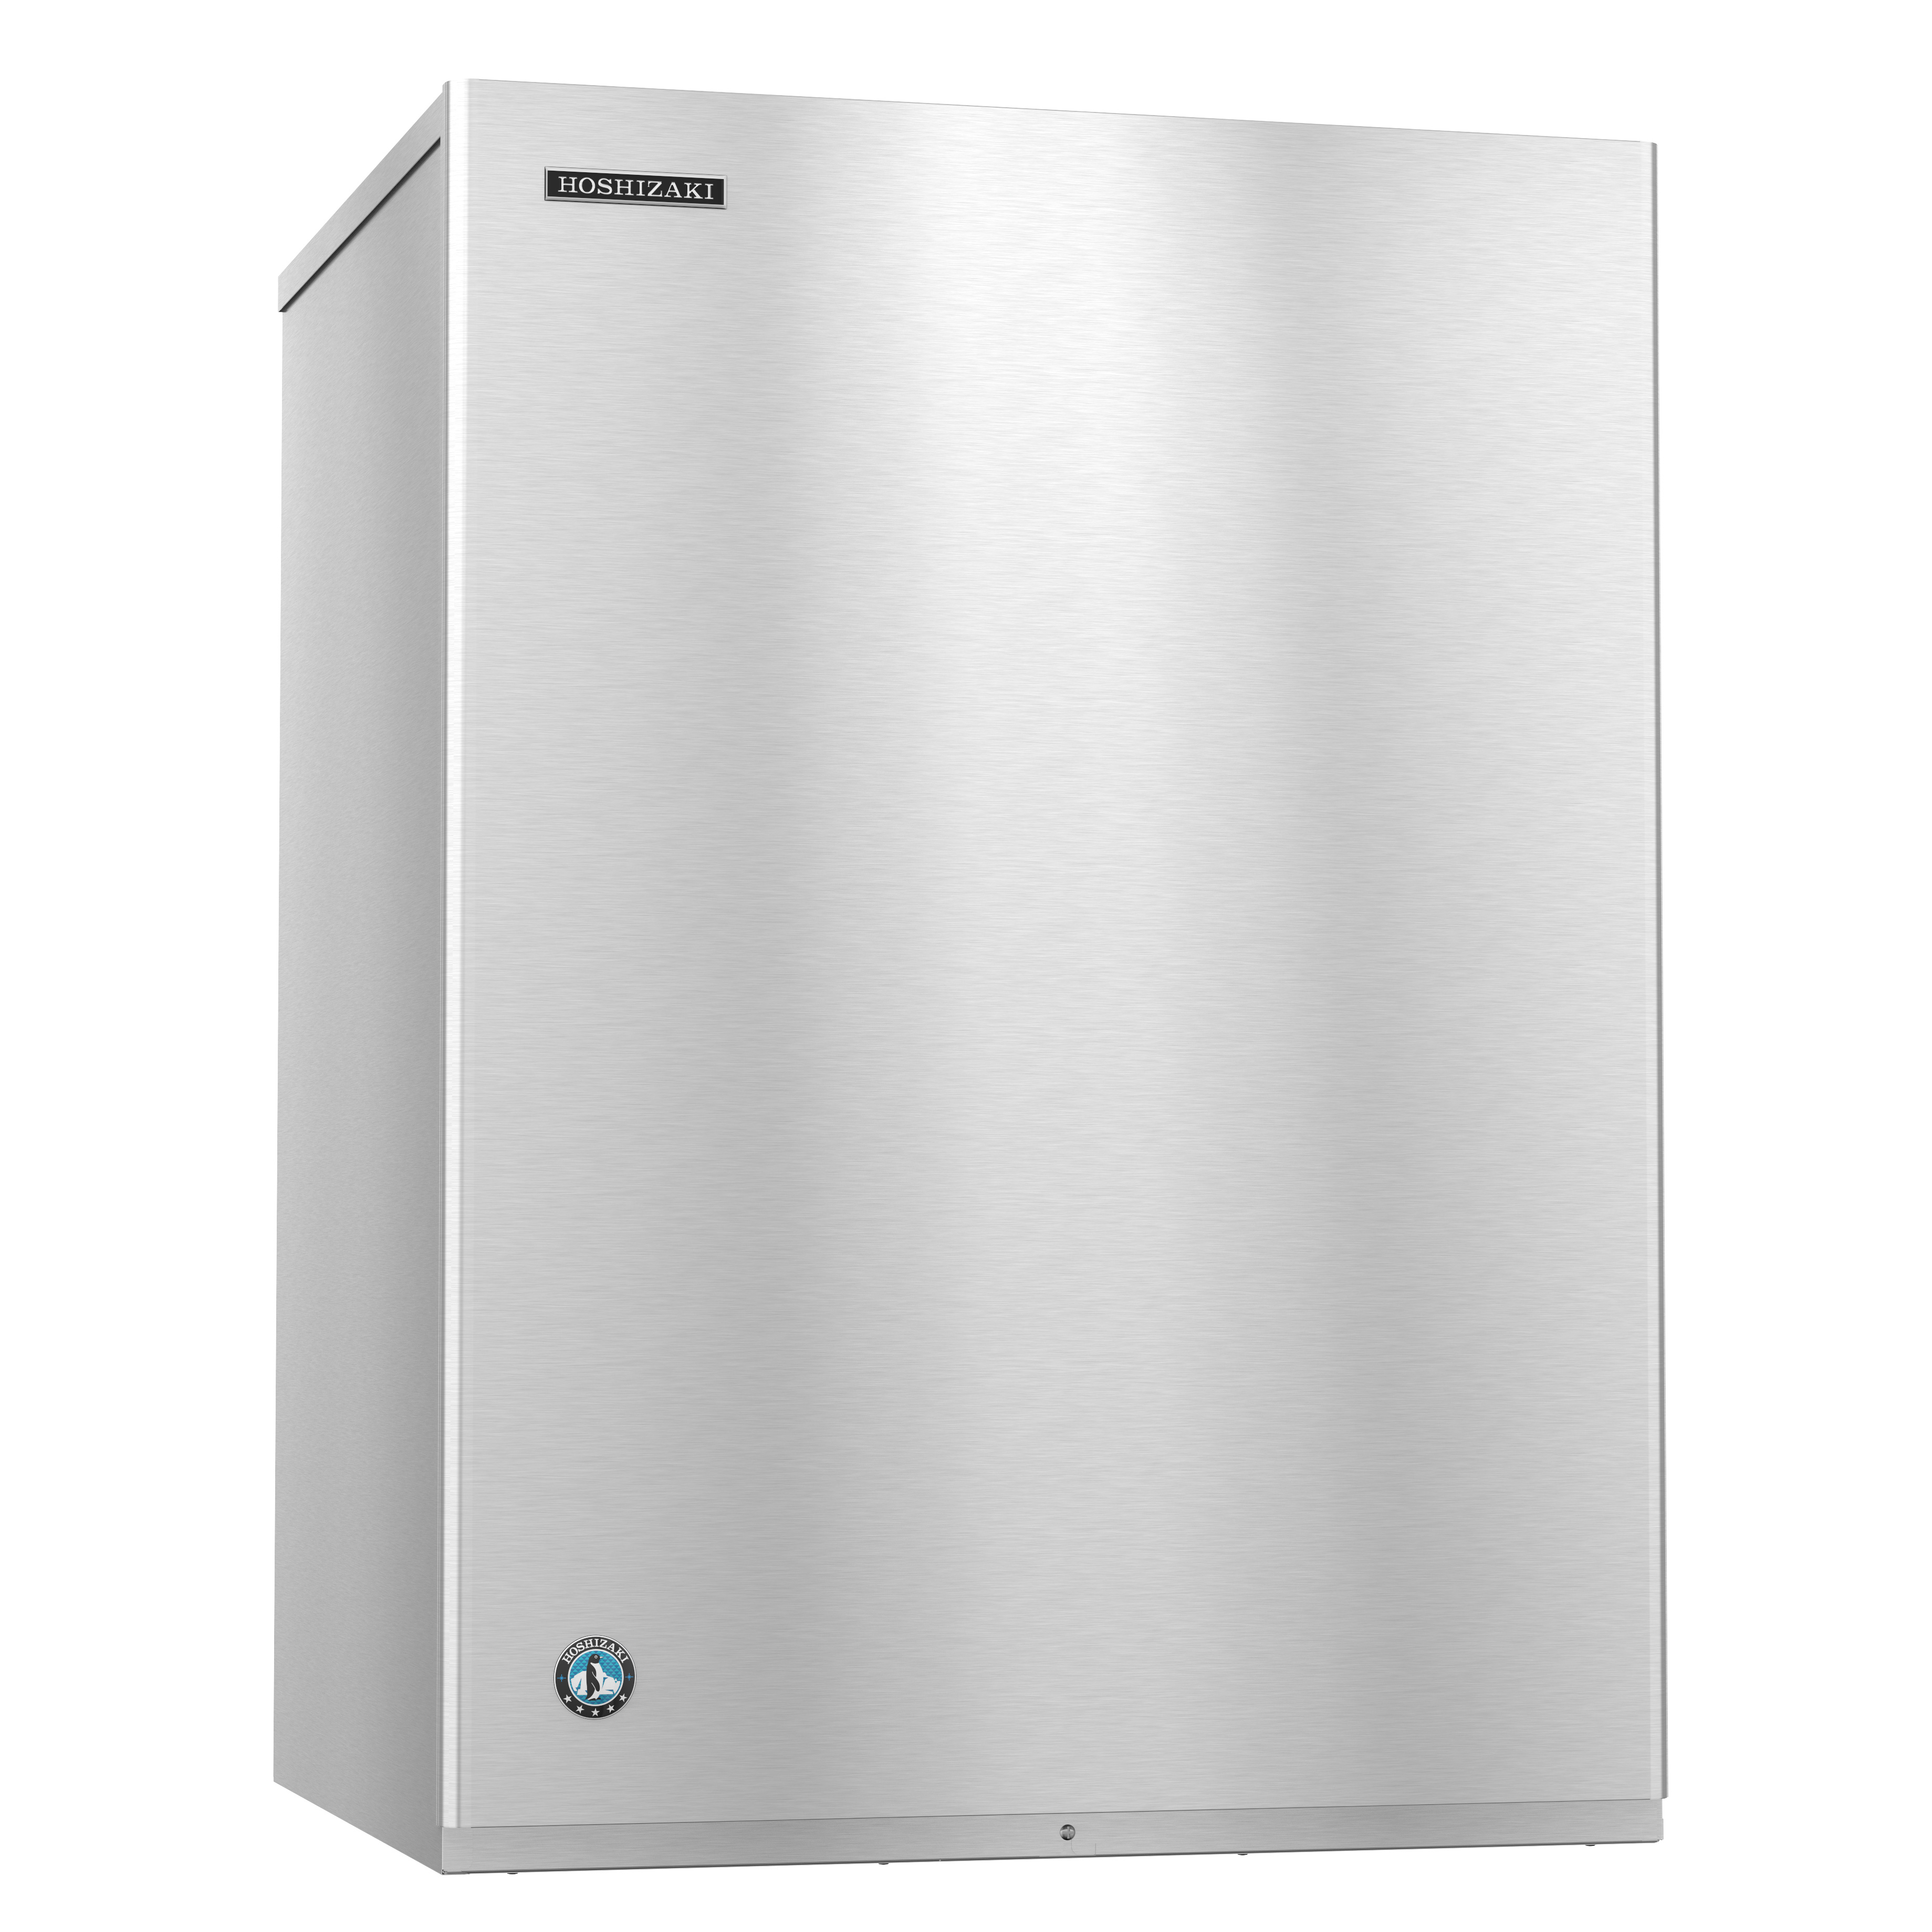 Hoshizaki KM-1340MWJ ice cubers, ice storage & ice dispensers